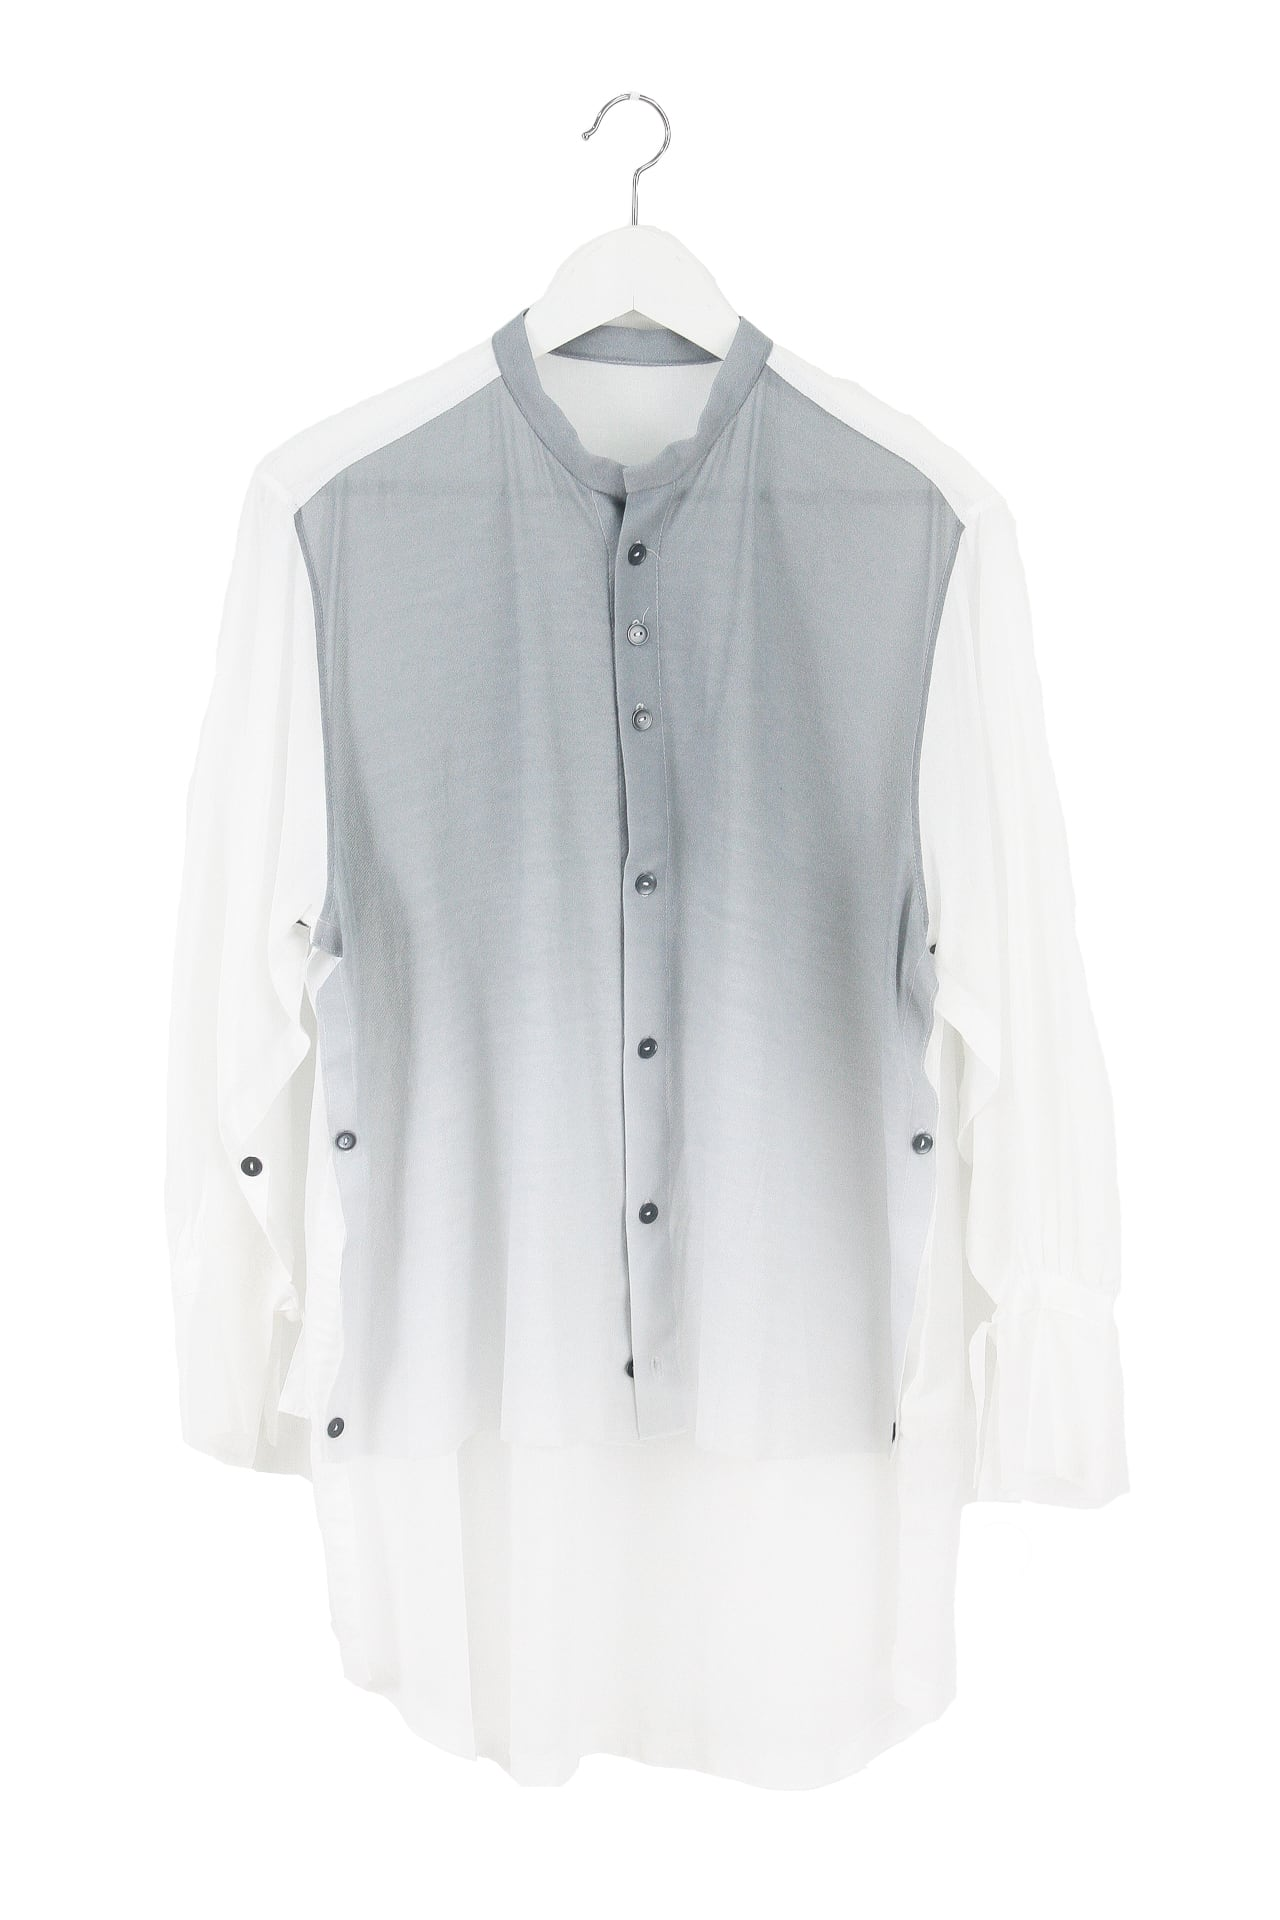 GRADATION  SHIRT/STOLE【COTTON コットン】 グラデーションシャツストール[登録意匠]SILVER GRAY 2302  [税/送料込み][受注生産]